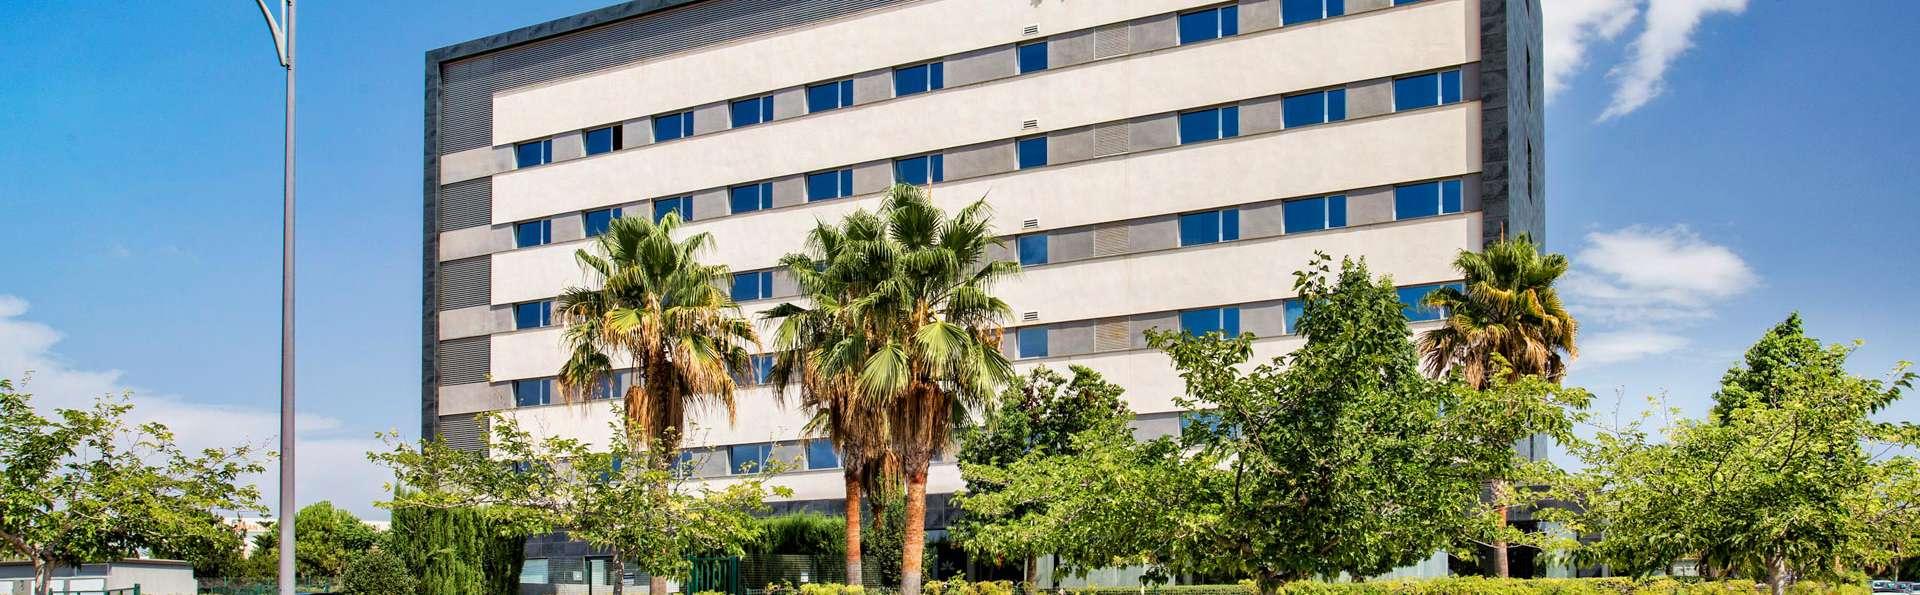 Hotel Táctica  - EDIT_FRONT_03.jpg